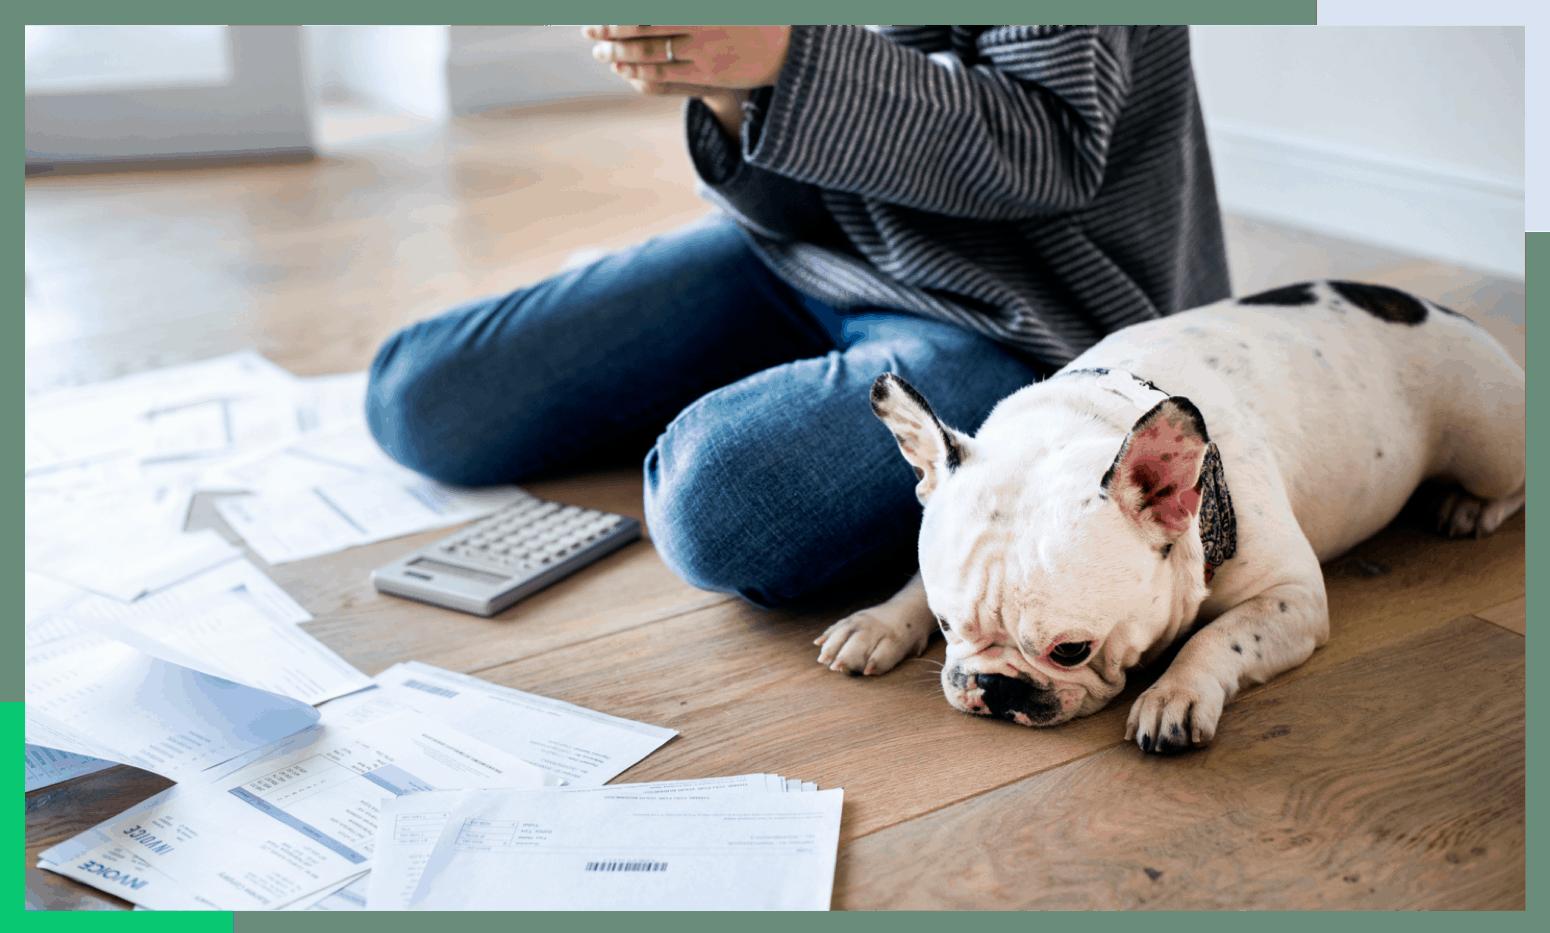 woman sitting on floor looking at bills